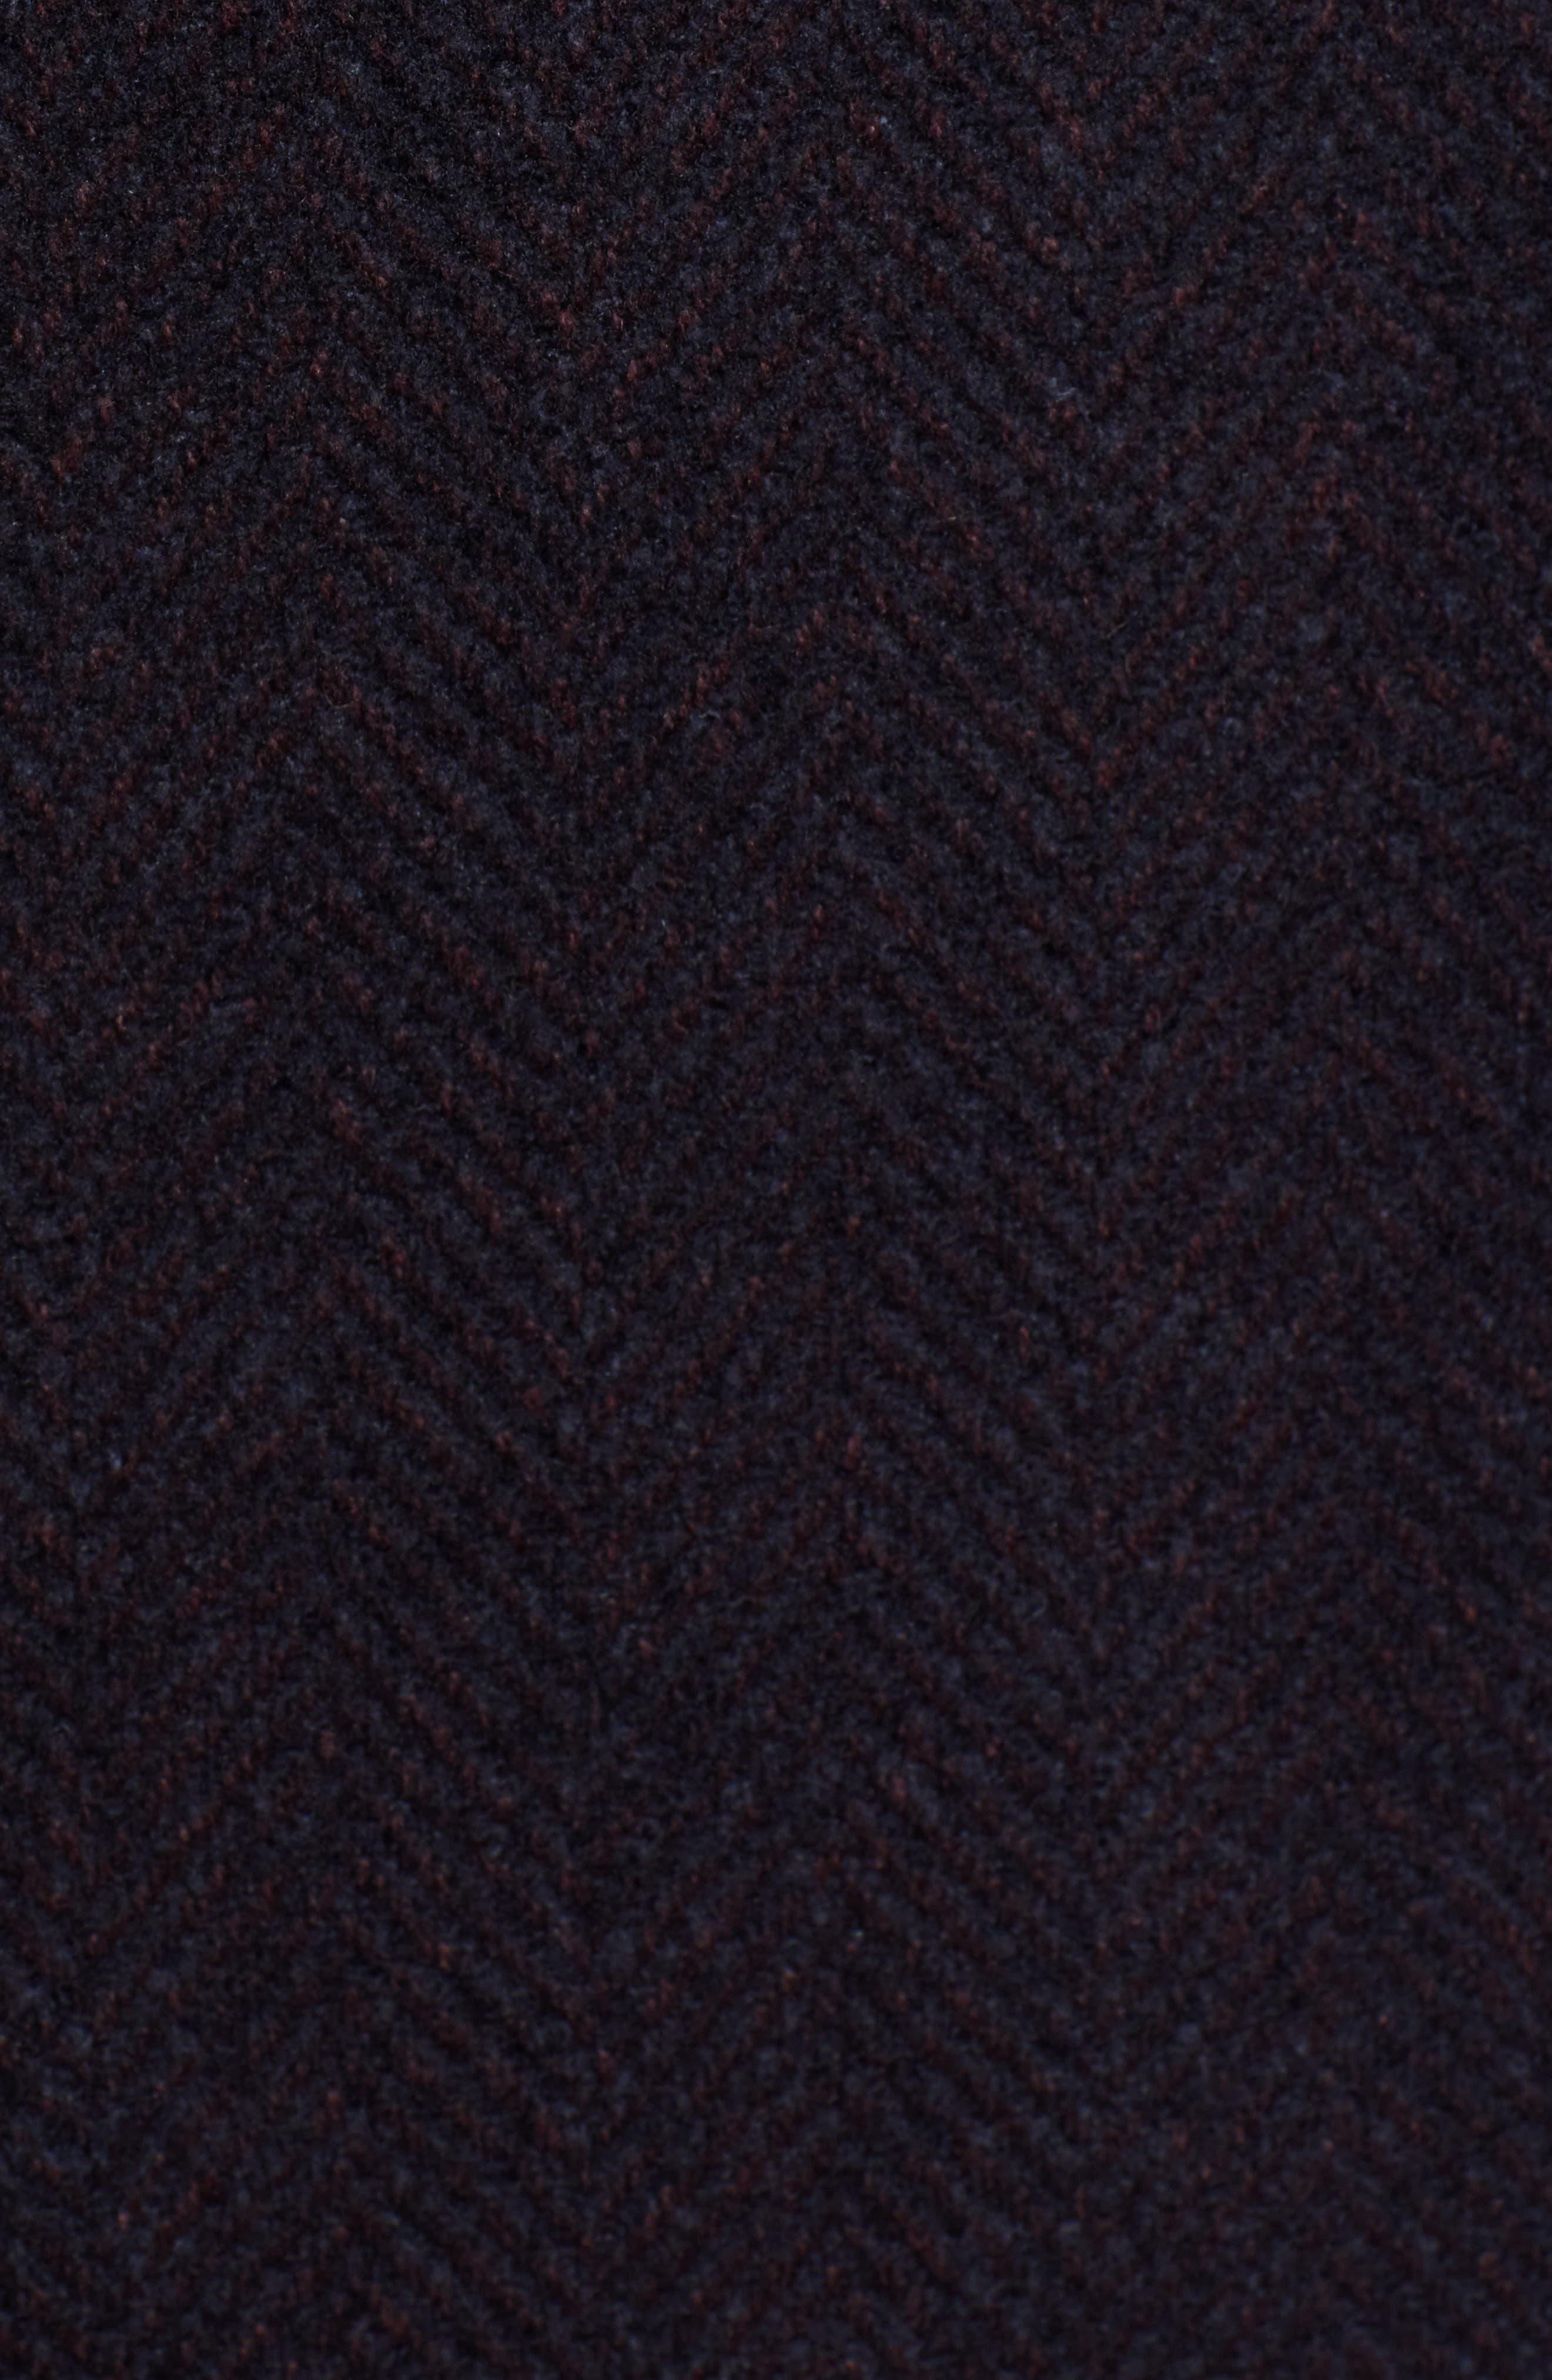 x Nordstrom Nye Wool Blend Top Coat,                             Alternate thumbnail 6, color,                             DARK RED